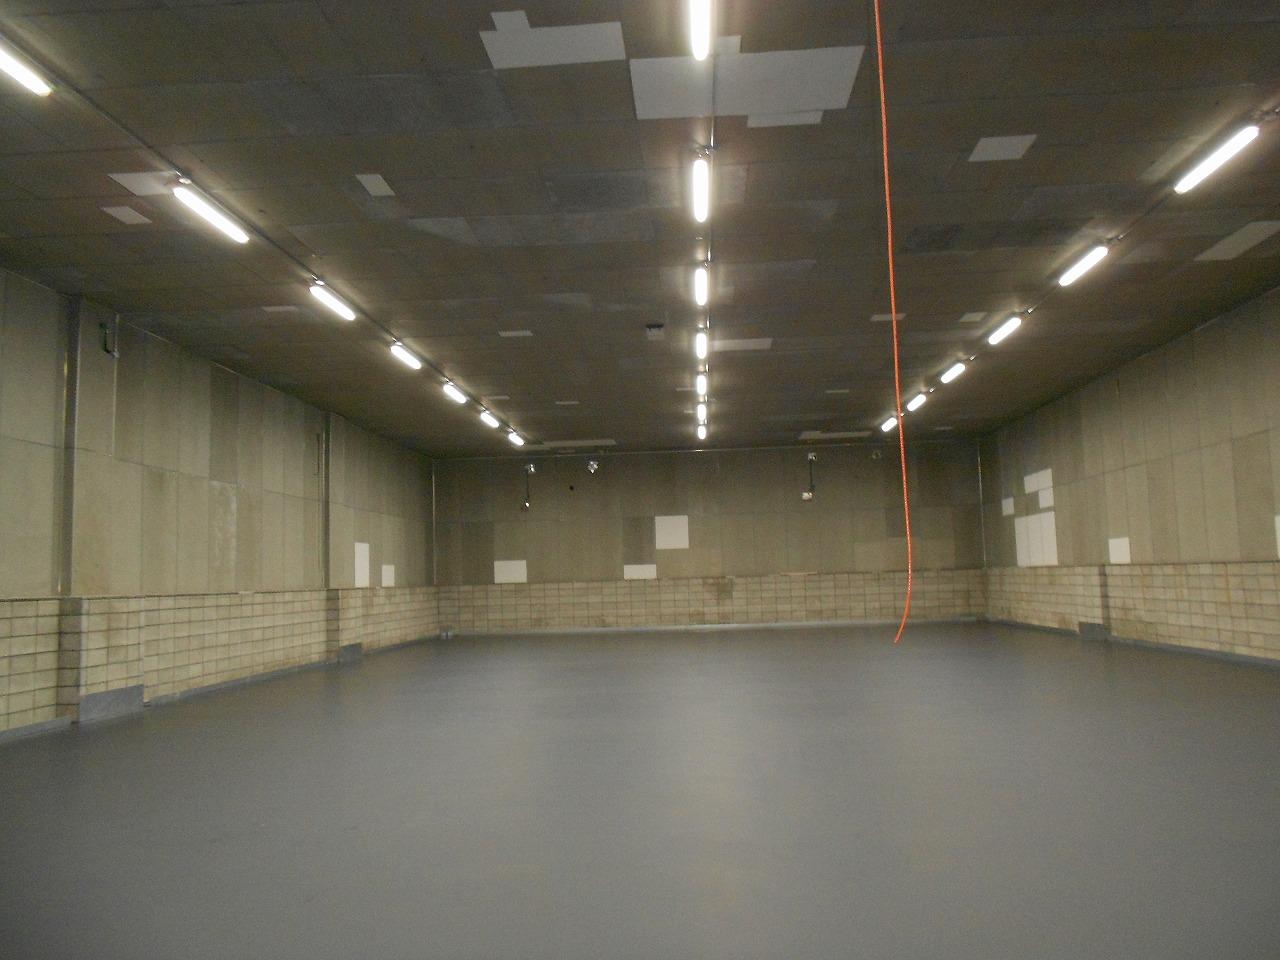 LEDランプ(冷凍仕様)及び床面塗装工事